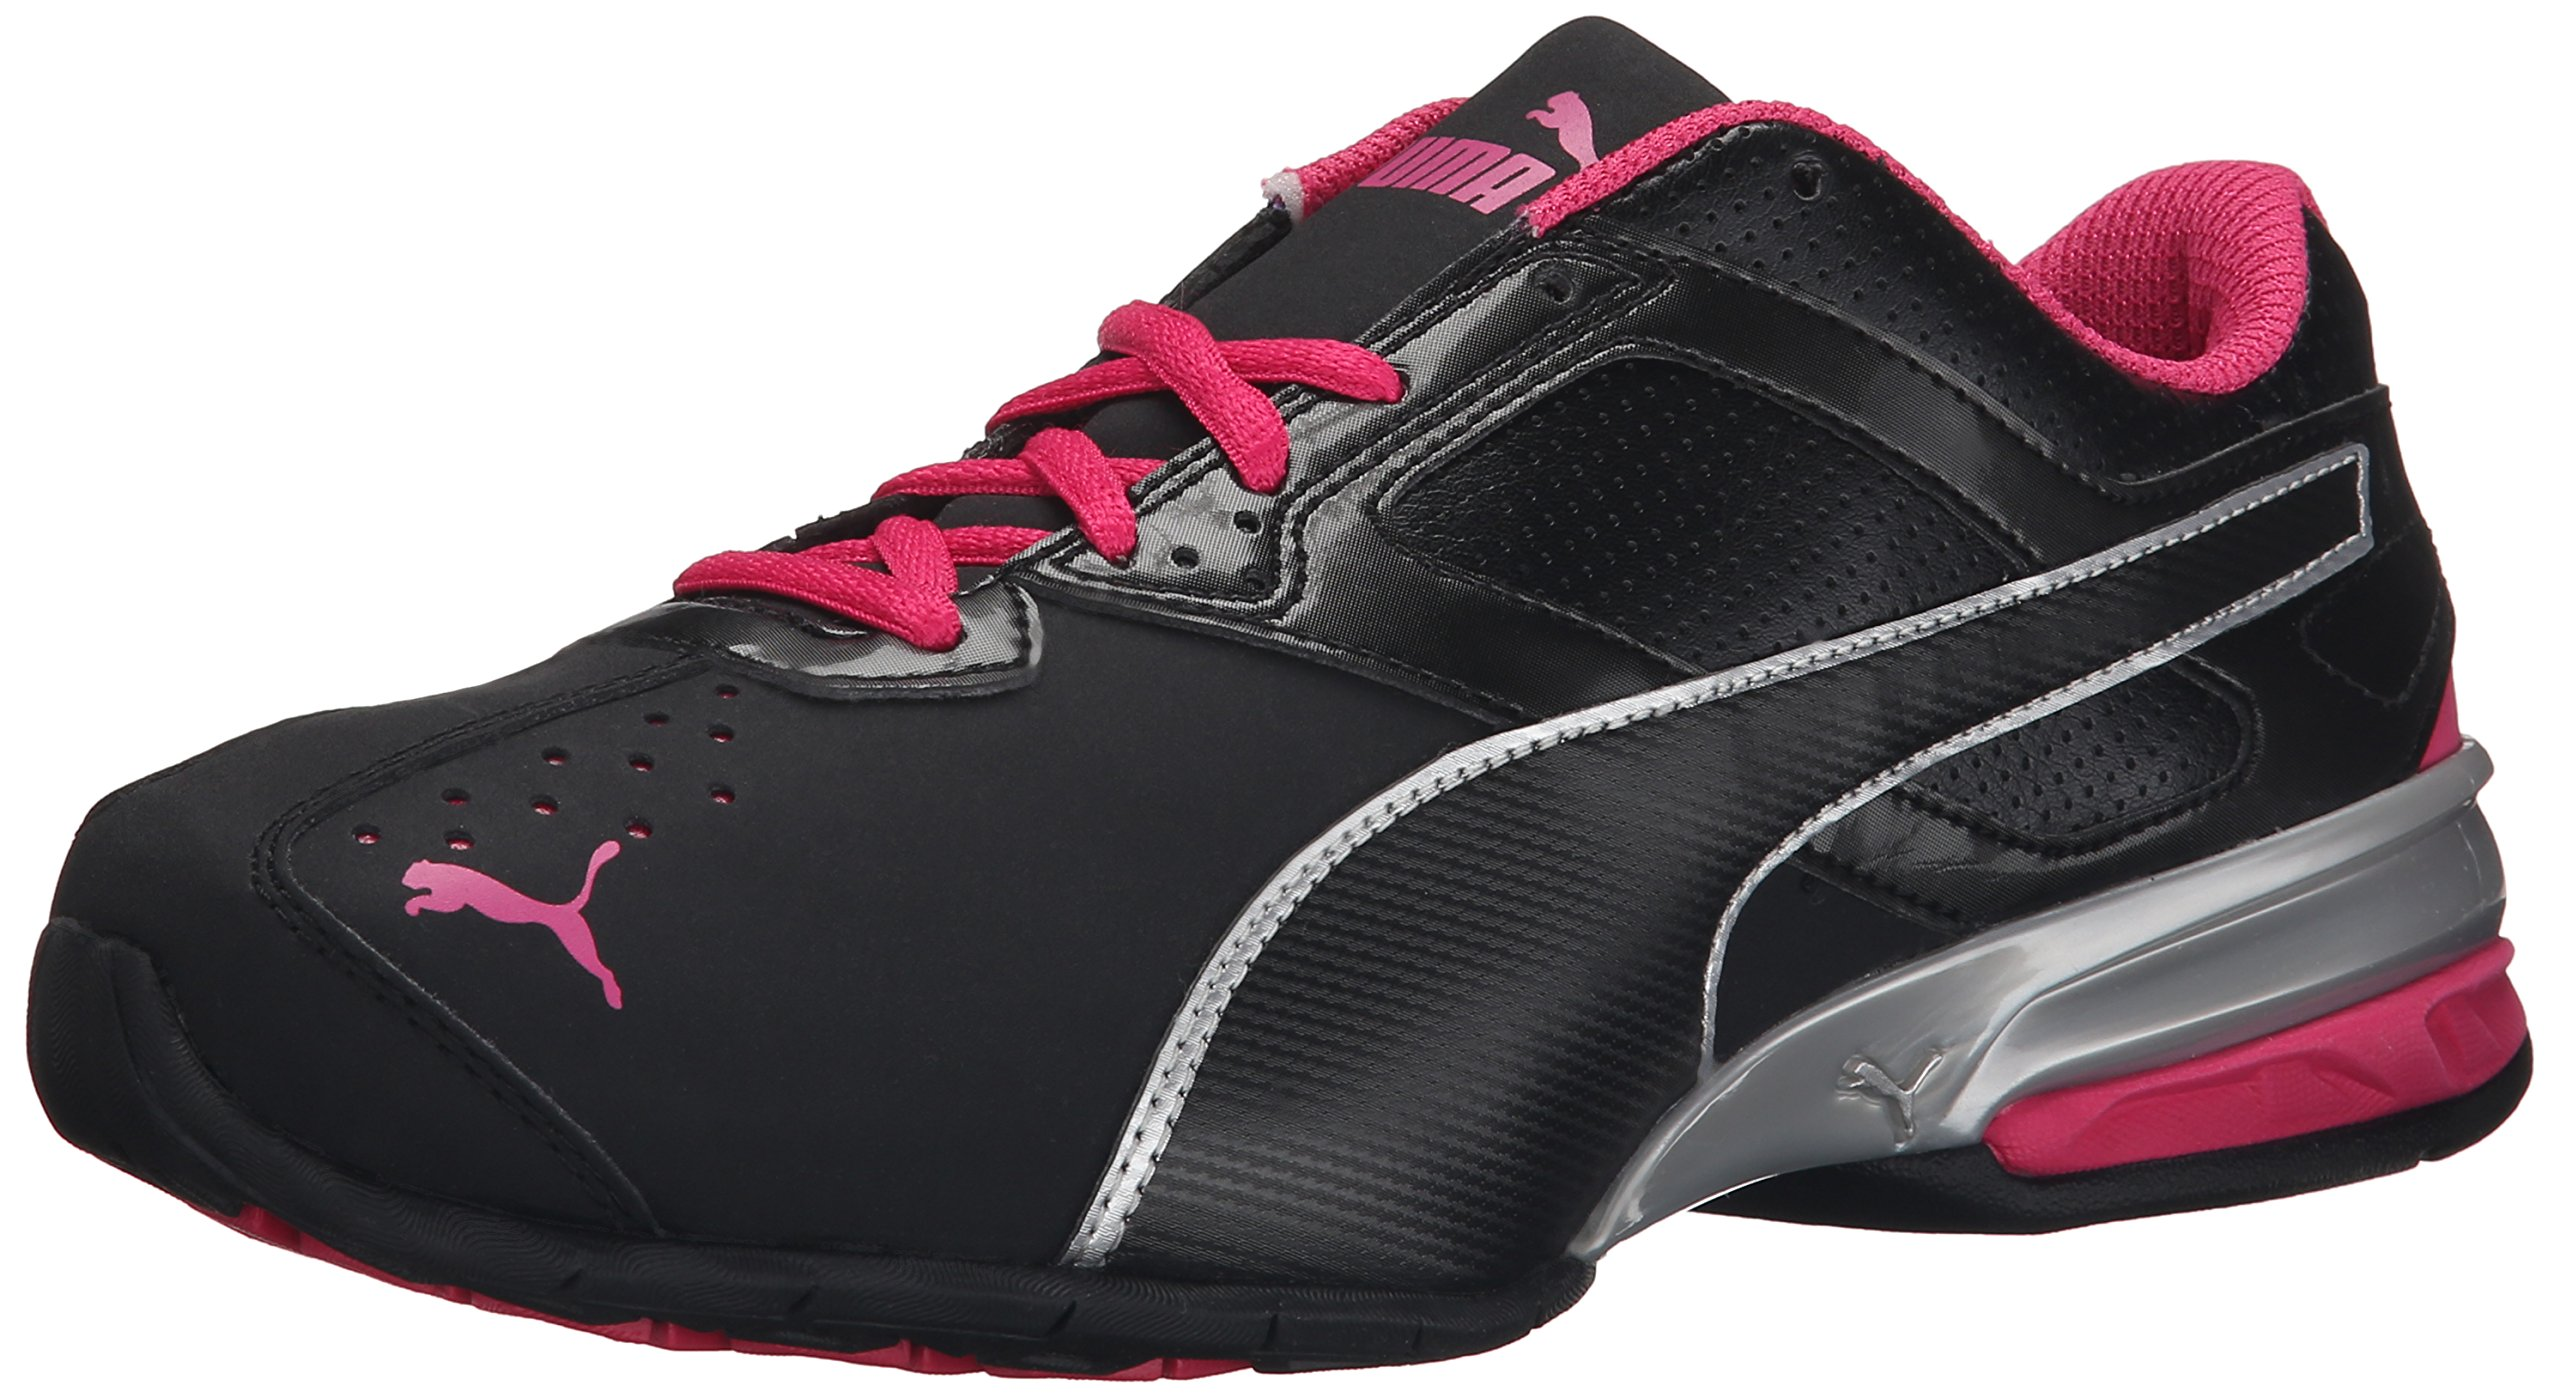 PUMA Women's Tazon 6 Wide Women's Training Shoe, Black/Puma Silver/Beetroot Purple, 6.5 B US